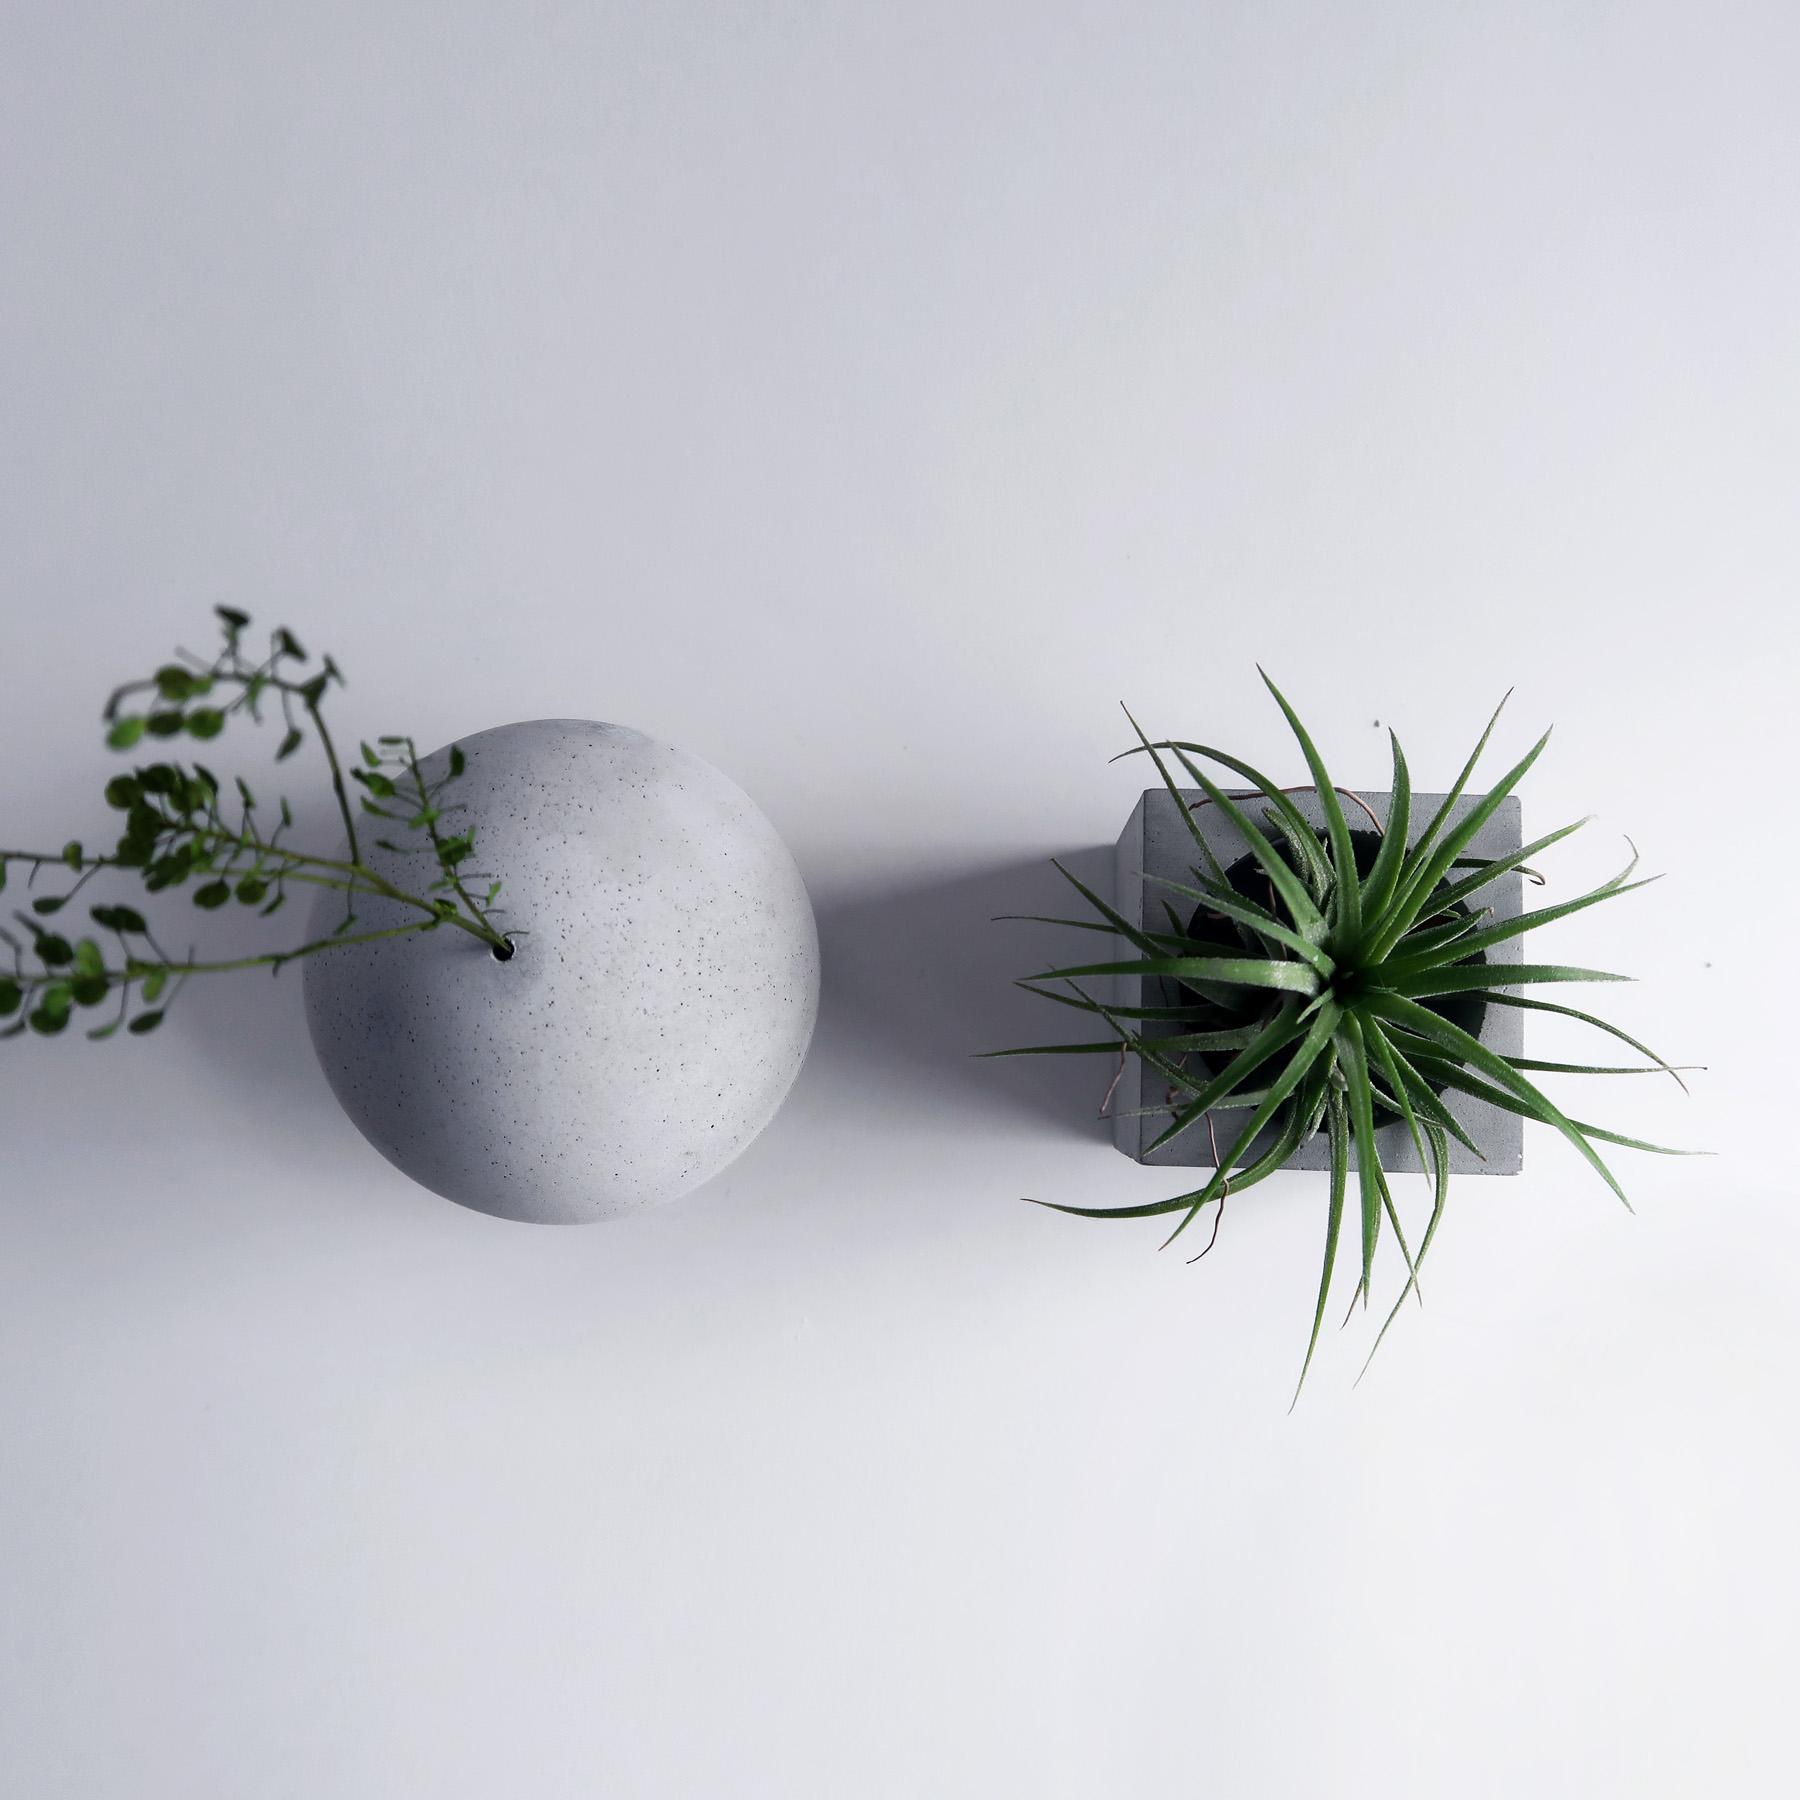 Home Decor 水泥設計家飾・擺飾・禮物